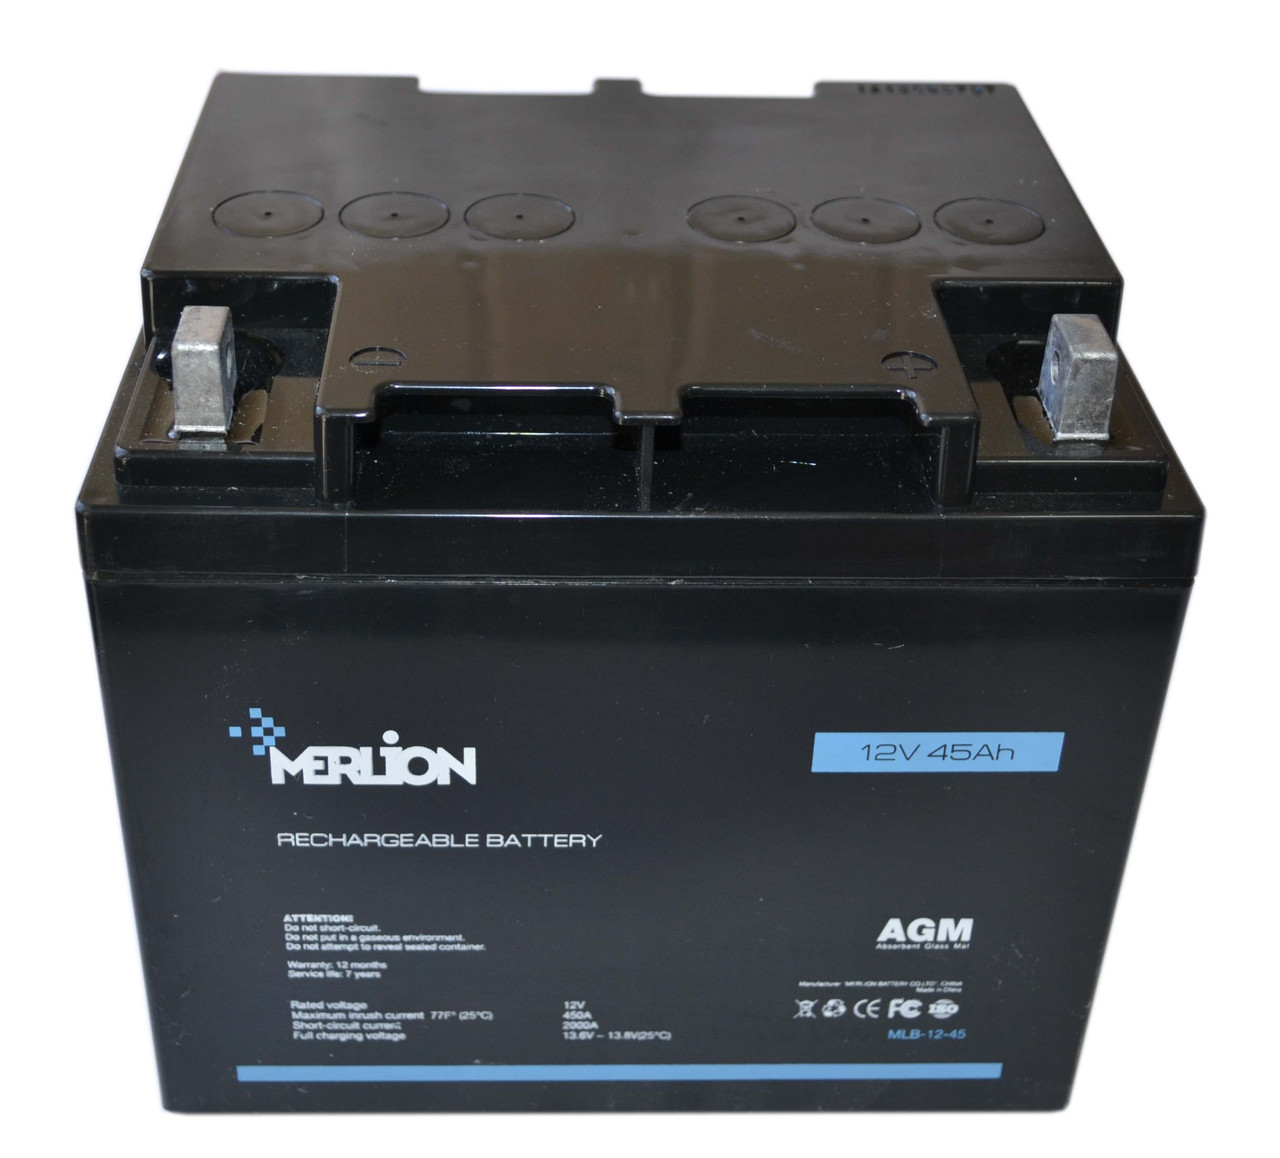 Аккумулятор мультигелевый MERLION MLB-12-45 12V 45AH, (AGM) для ИБП